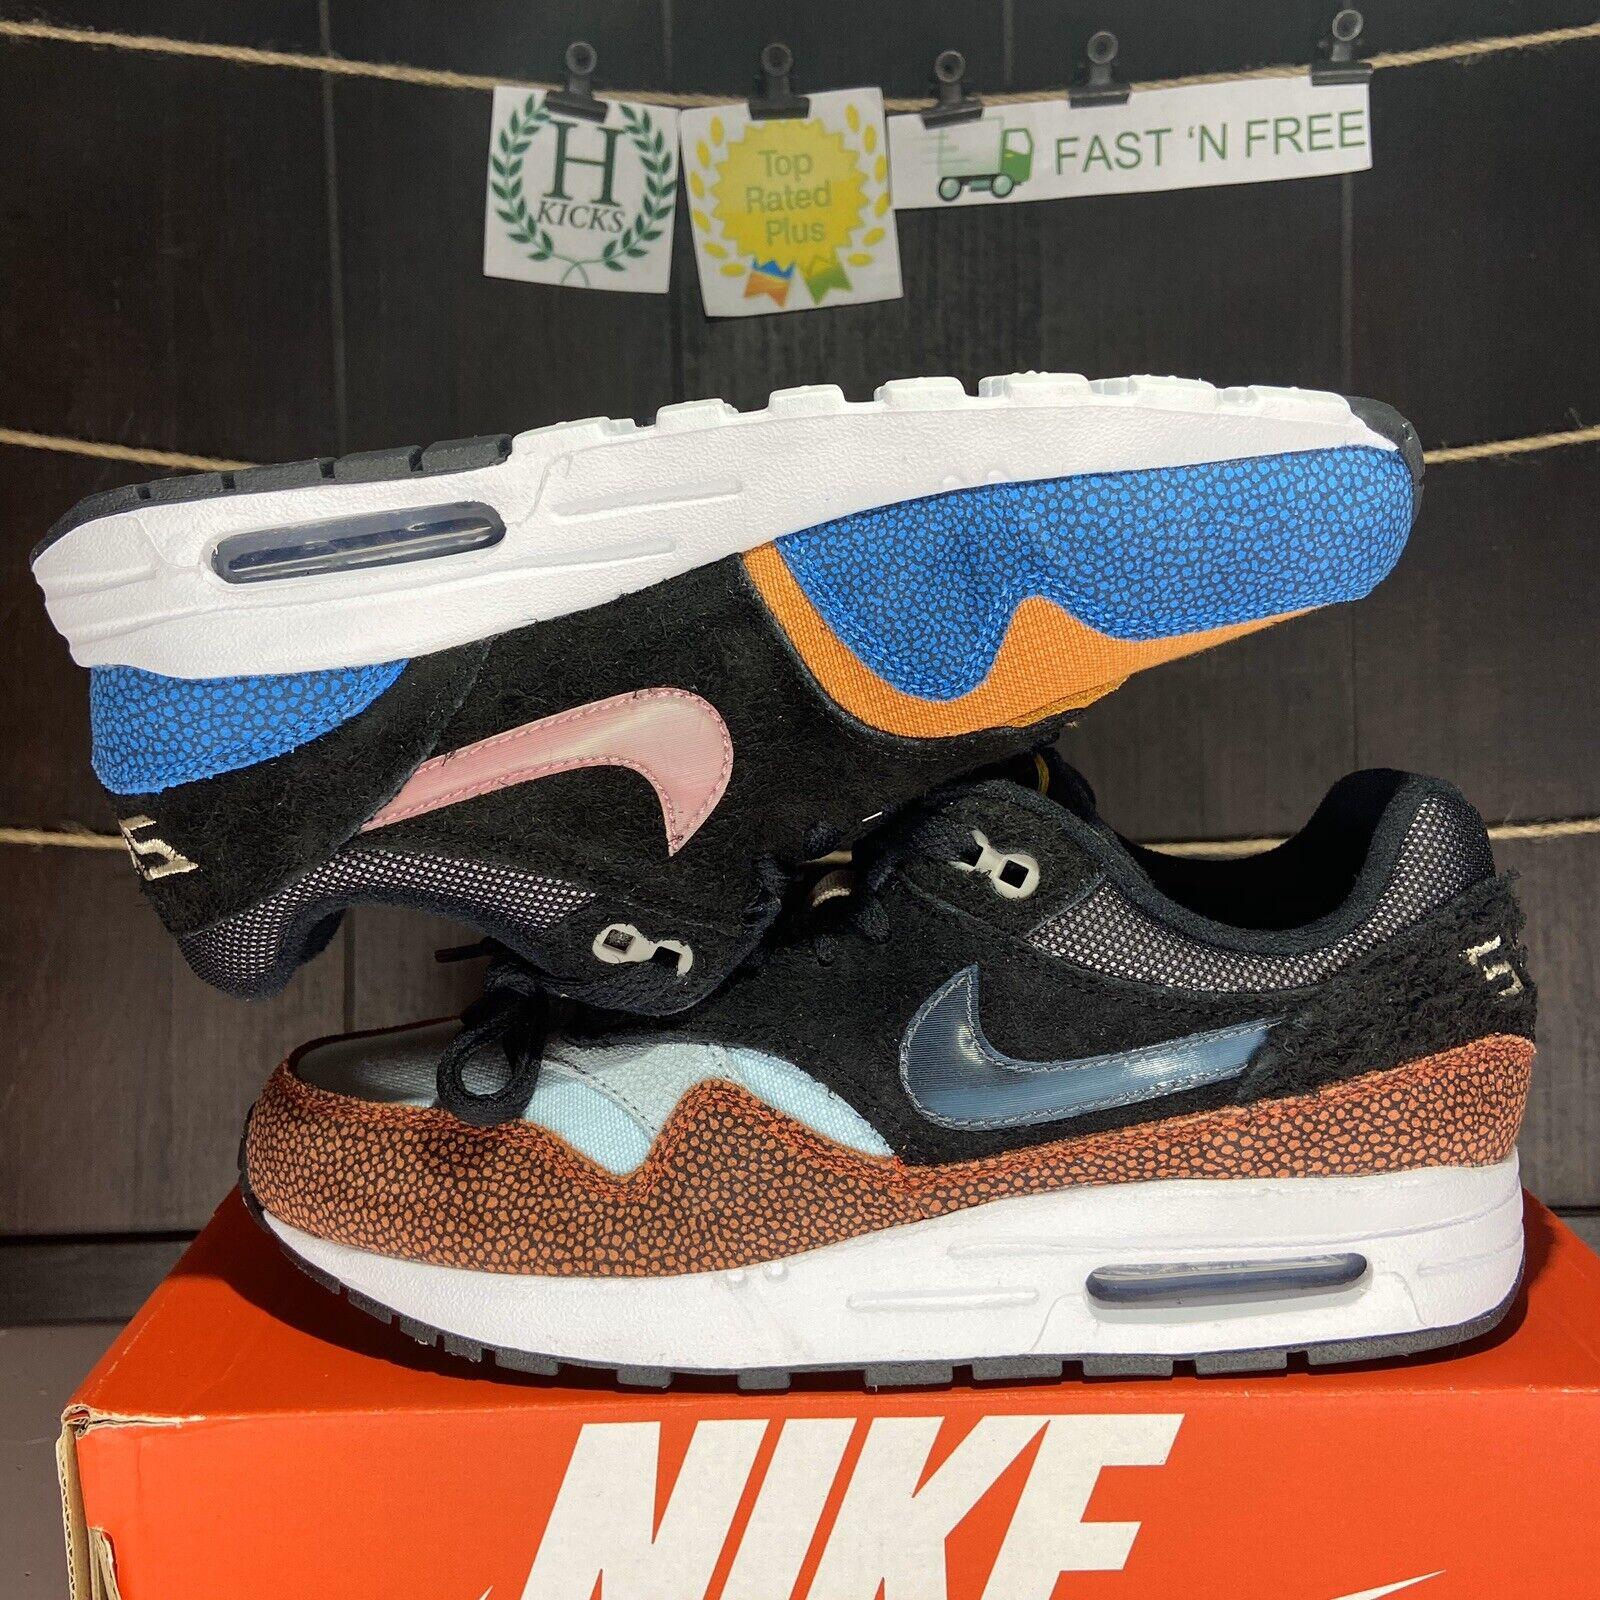 Nike De'Aaron Fox Air Max 1 Swipa the Fox CJ9888 001 Youth Grade School Sizes